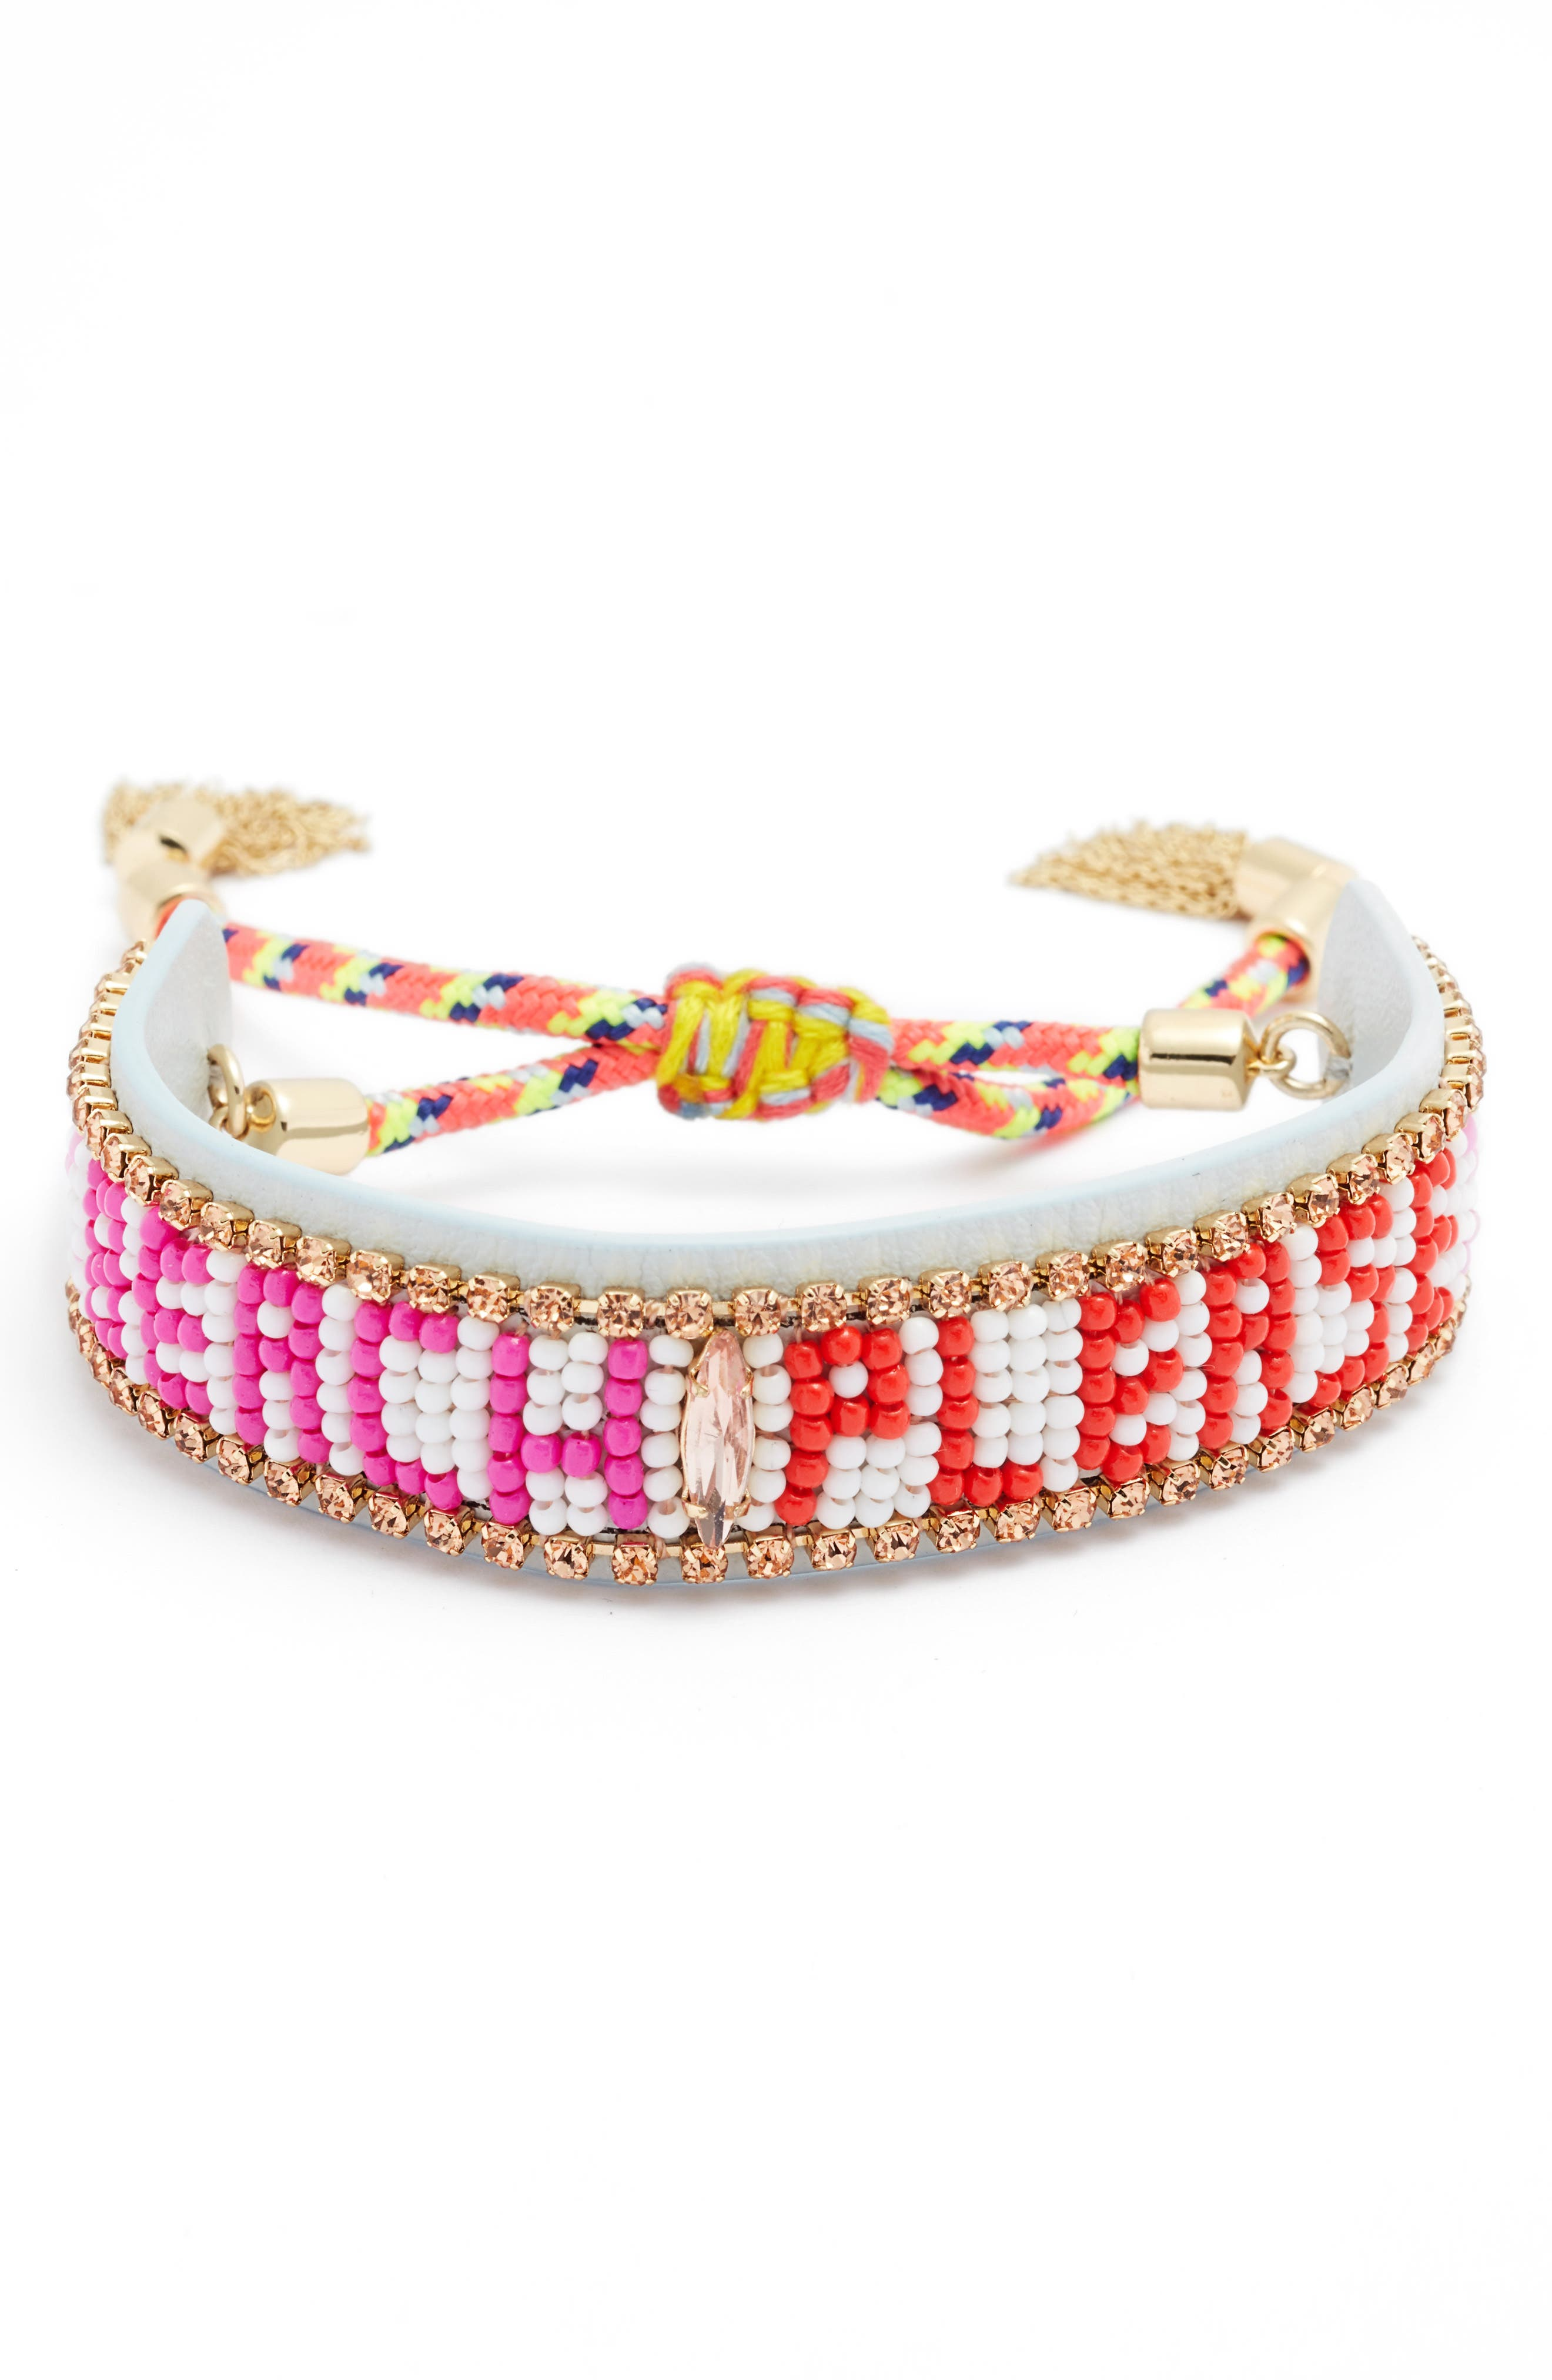 Beach Please Seed Bead Bracelet,                             Main thumbnail 1, color,                             White Multi